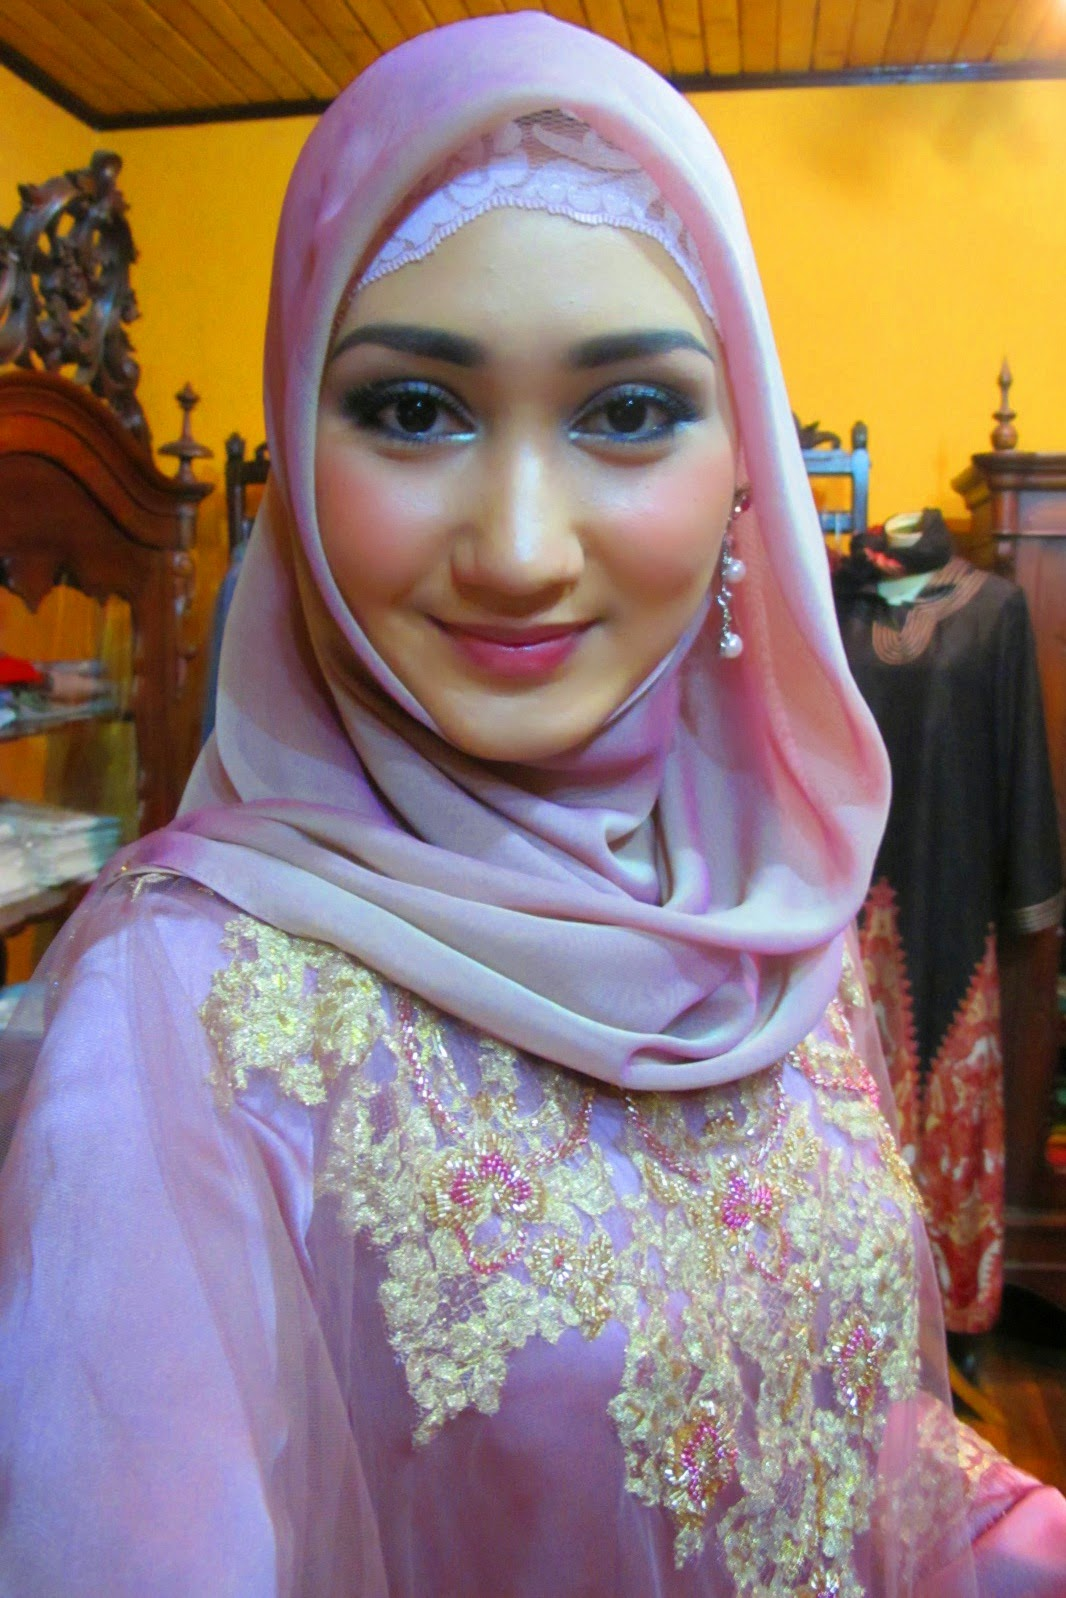 New Hijab 2014 Hijab Wing Dian Pelangi